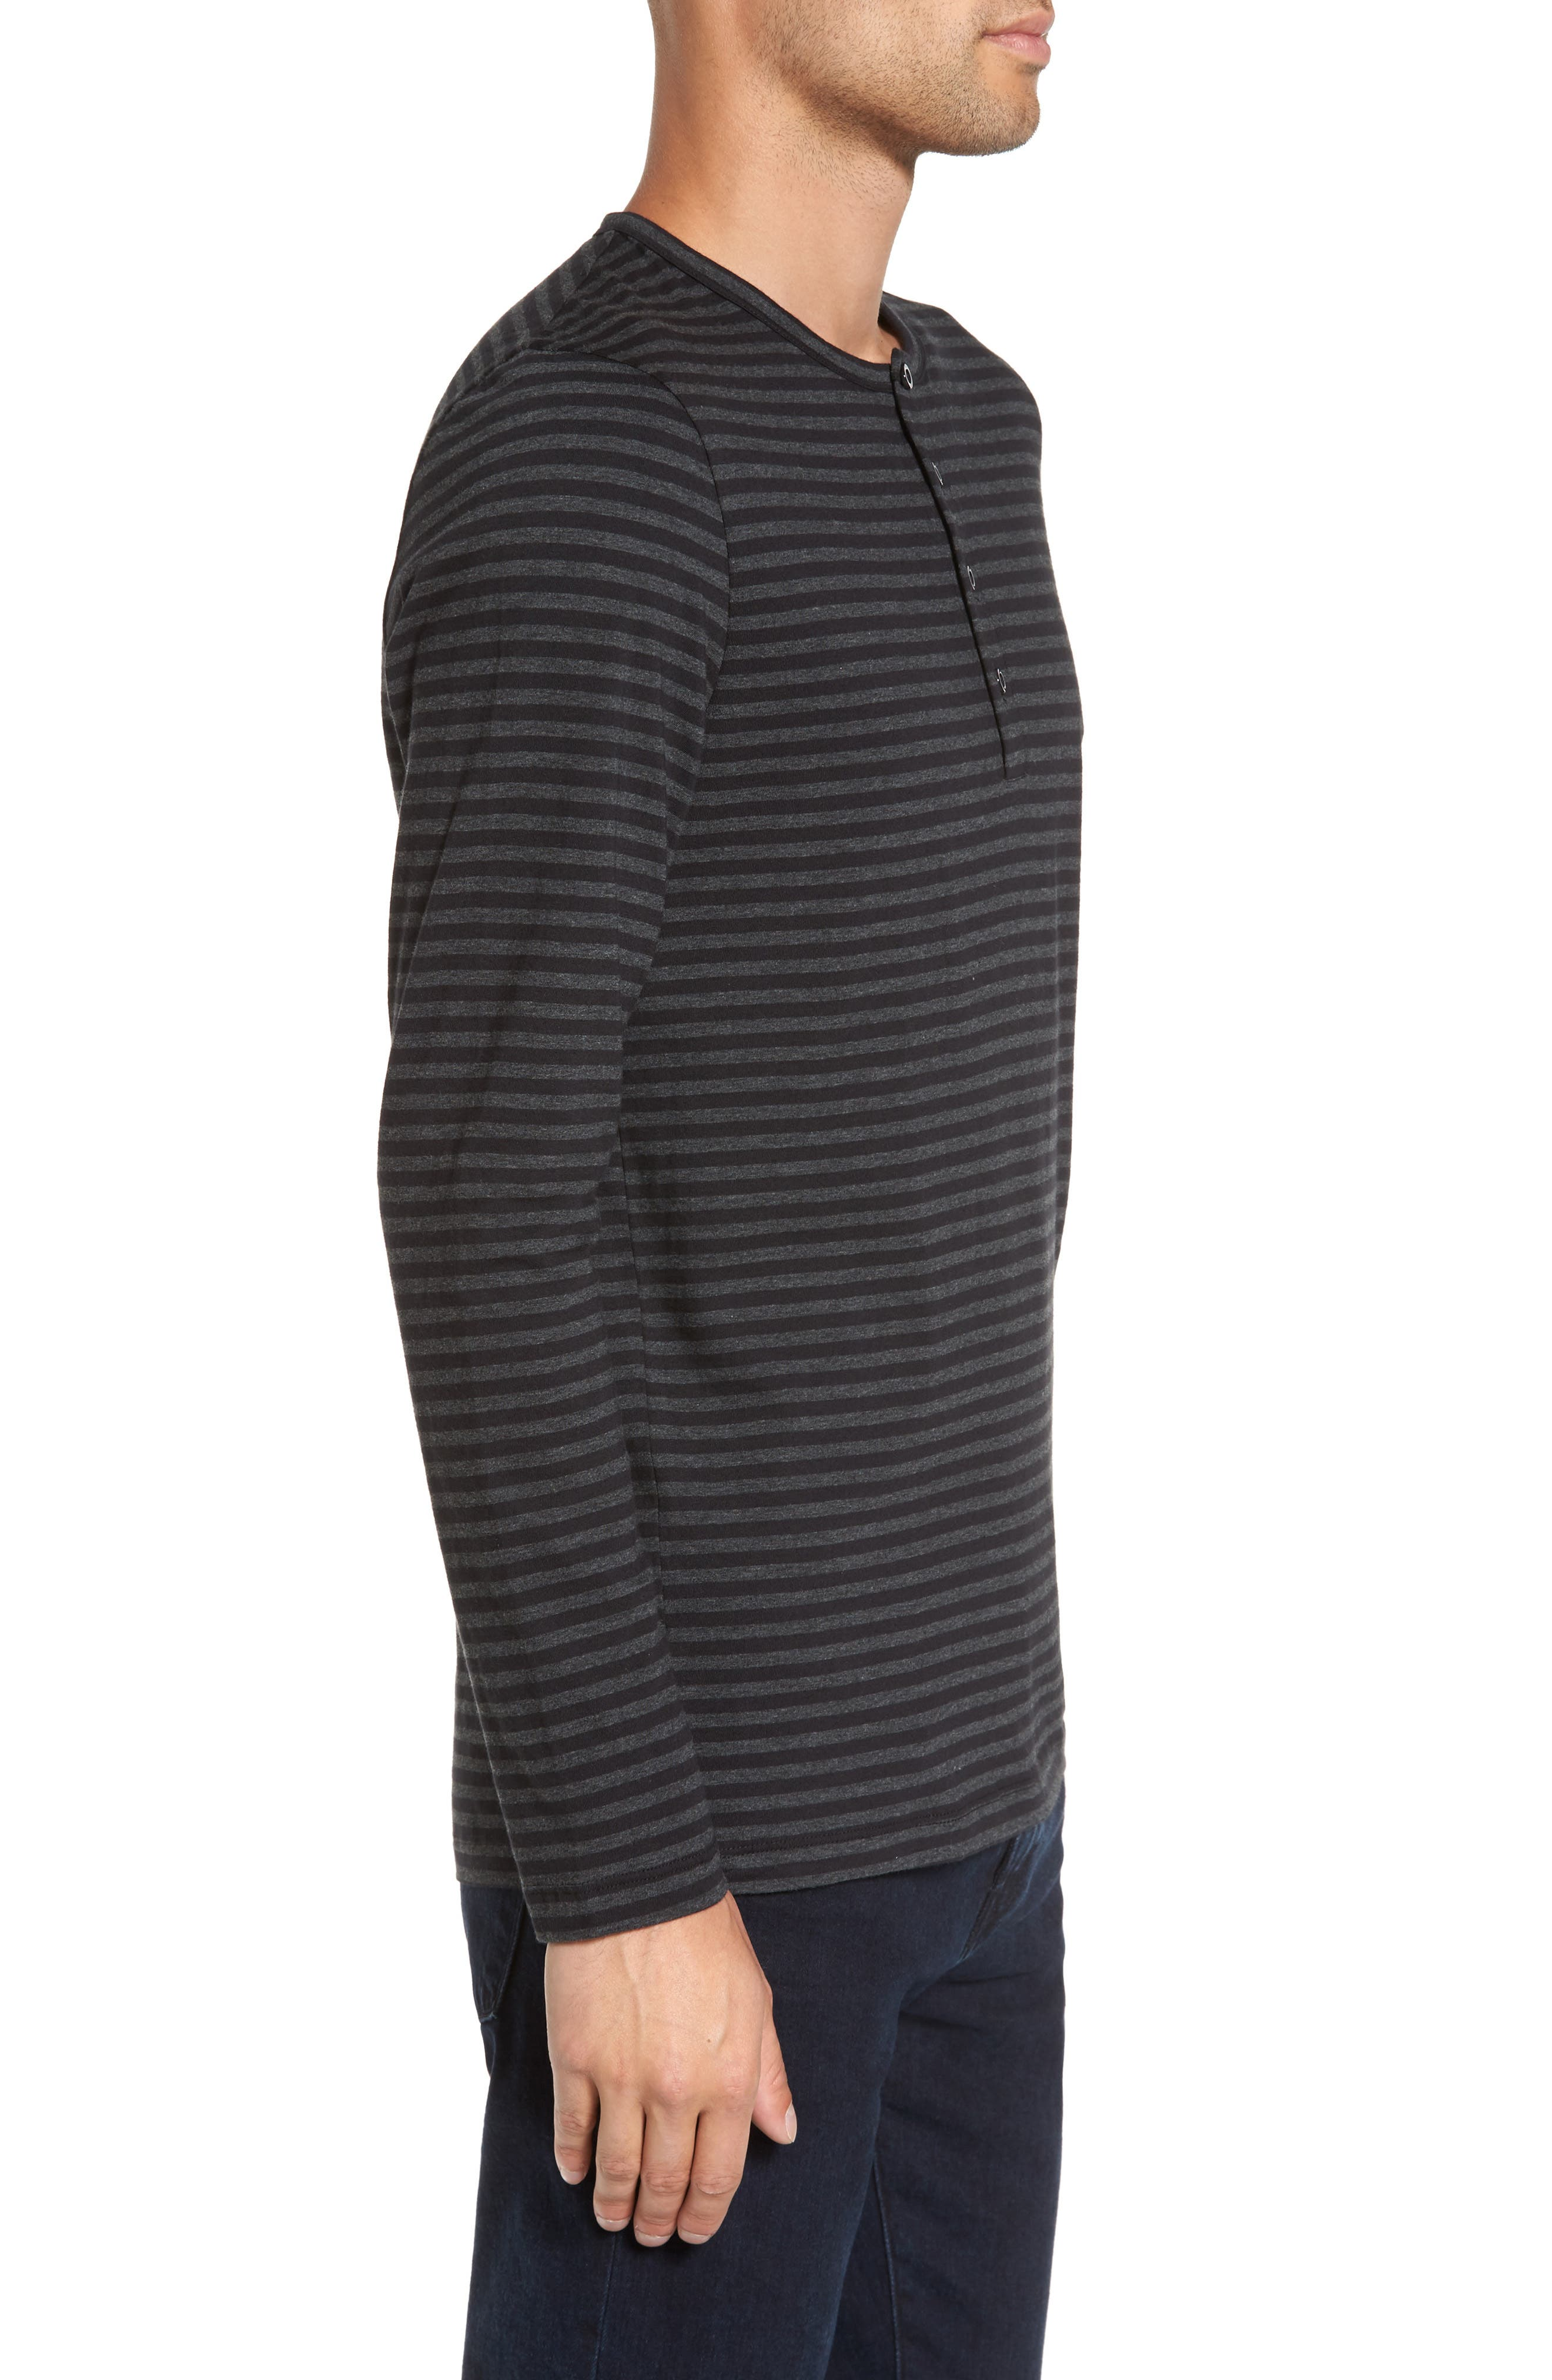 Long Sleeve Henley T-Shirt,                             Alternate thumbnail 3, color,                             Black/ Charcoal Stripe